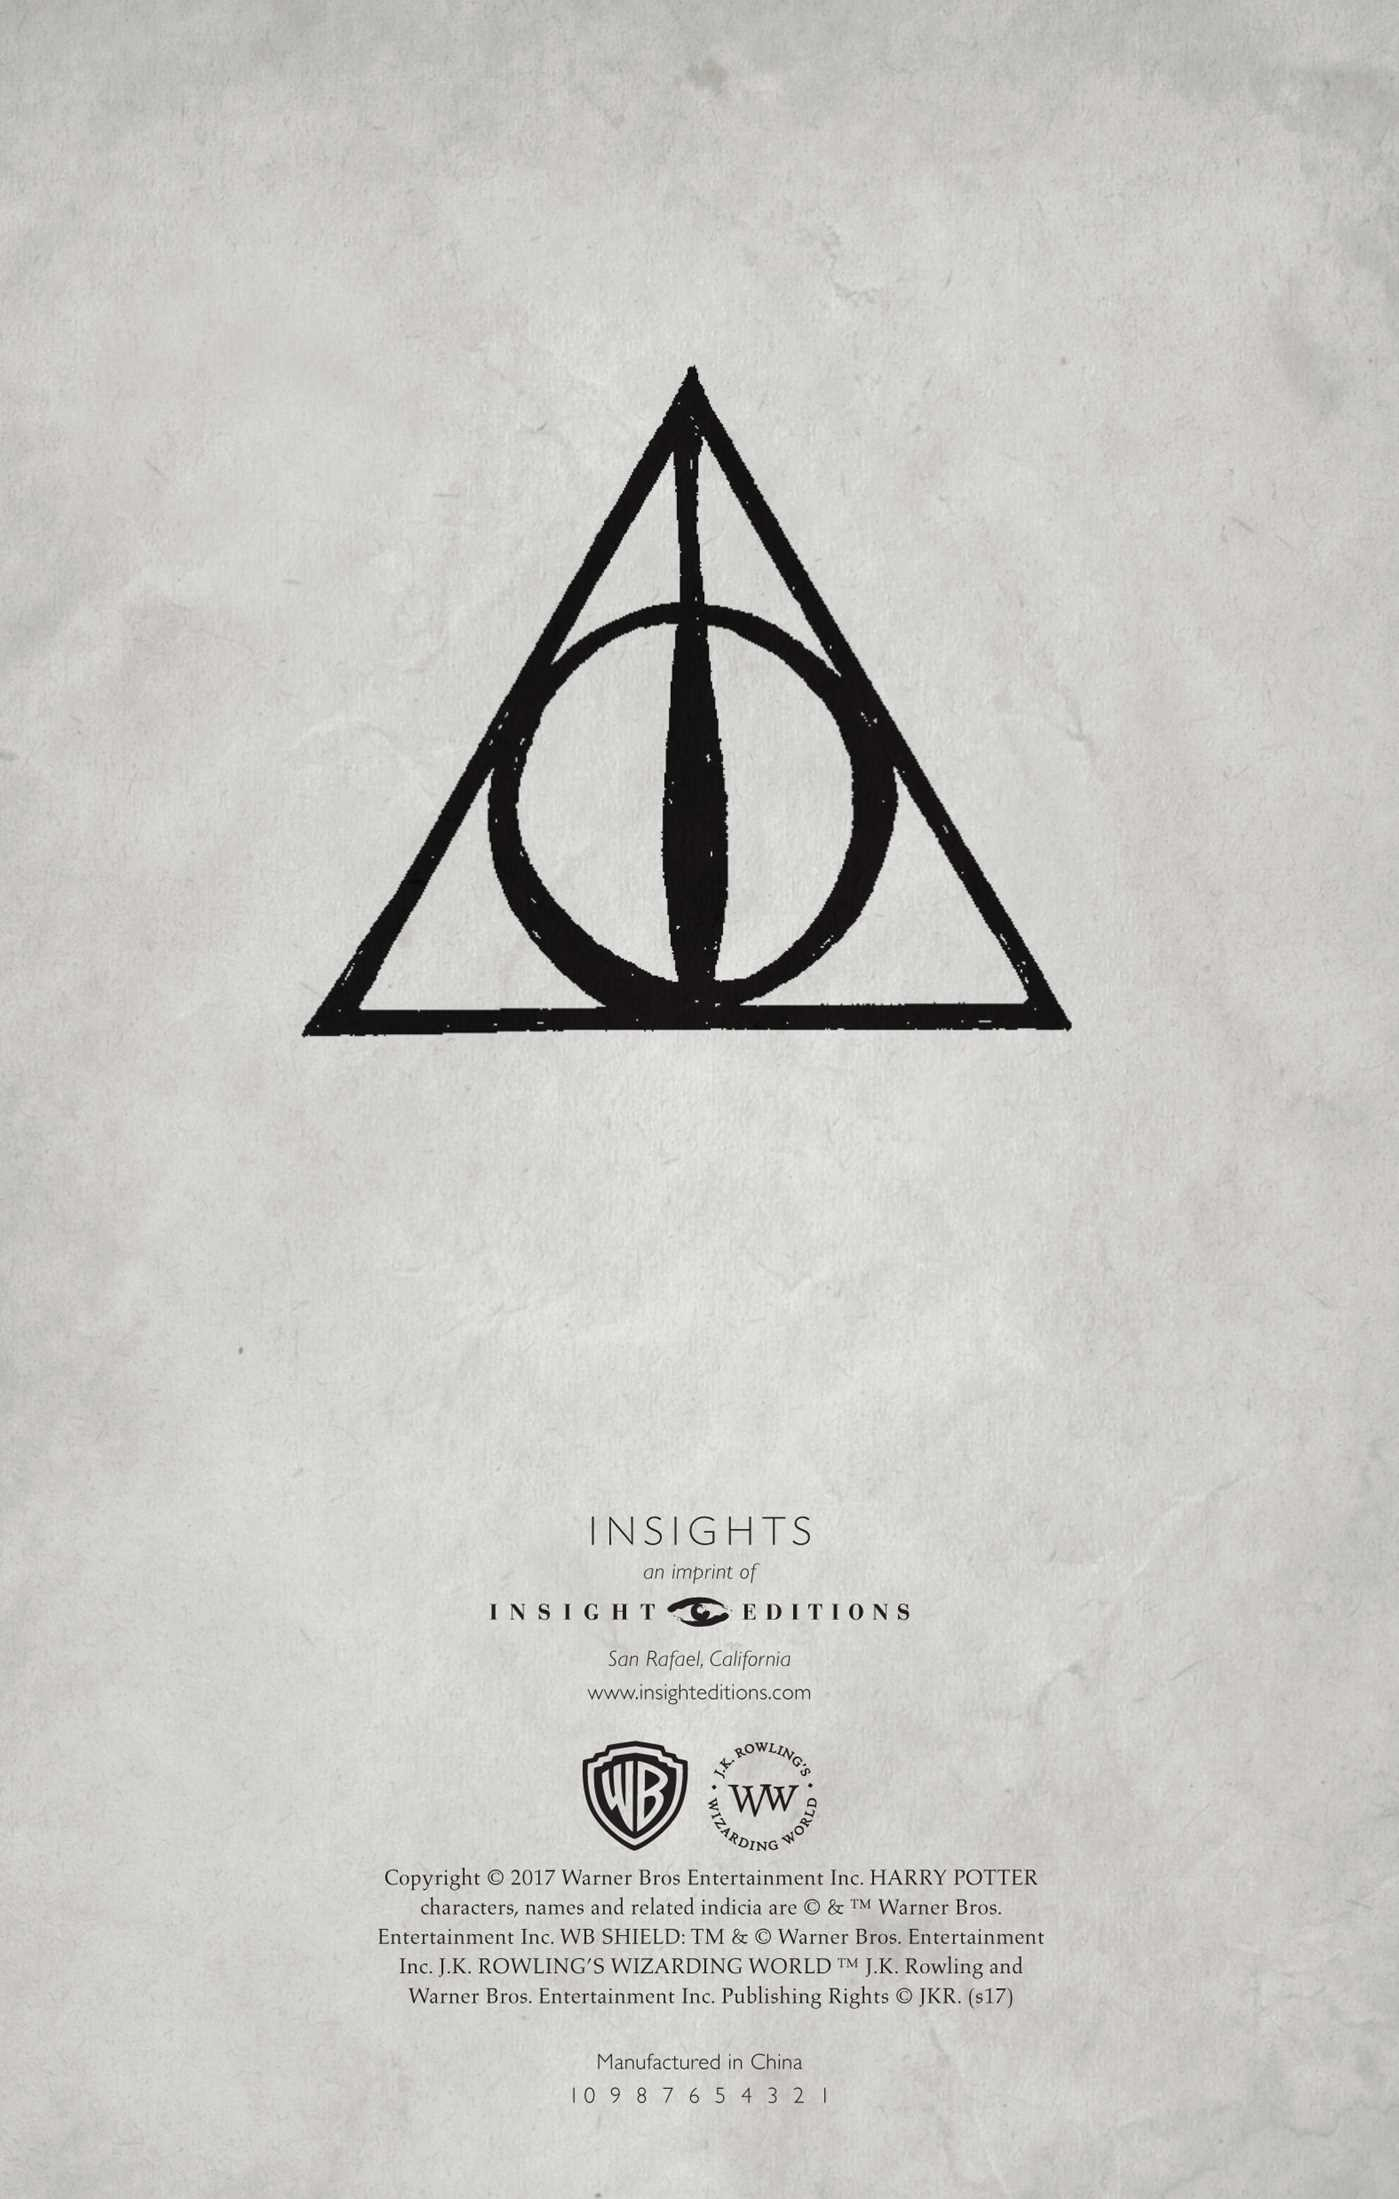 Harry Potter Book Art Hogwarts Harry Potter: The Deat...